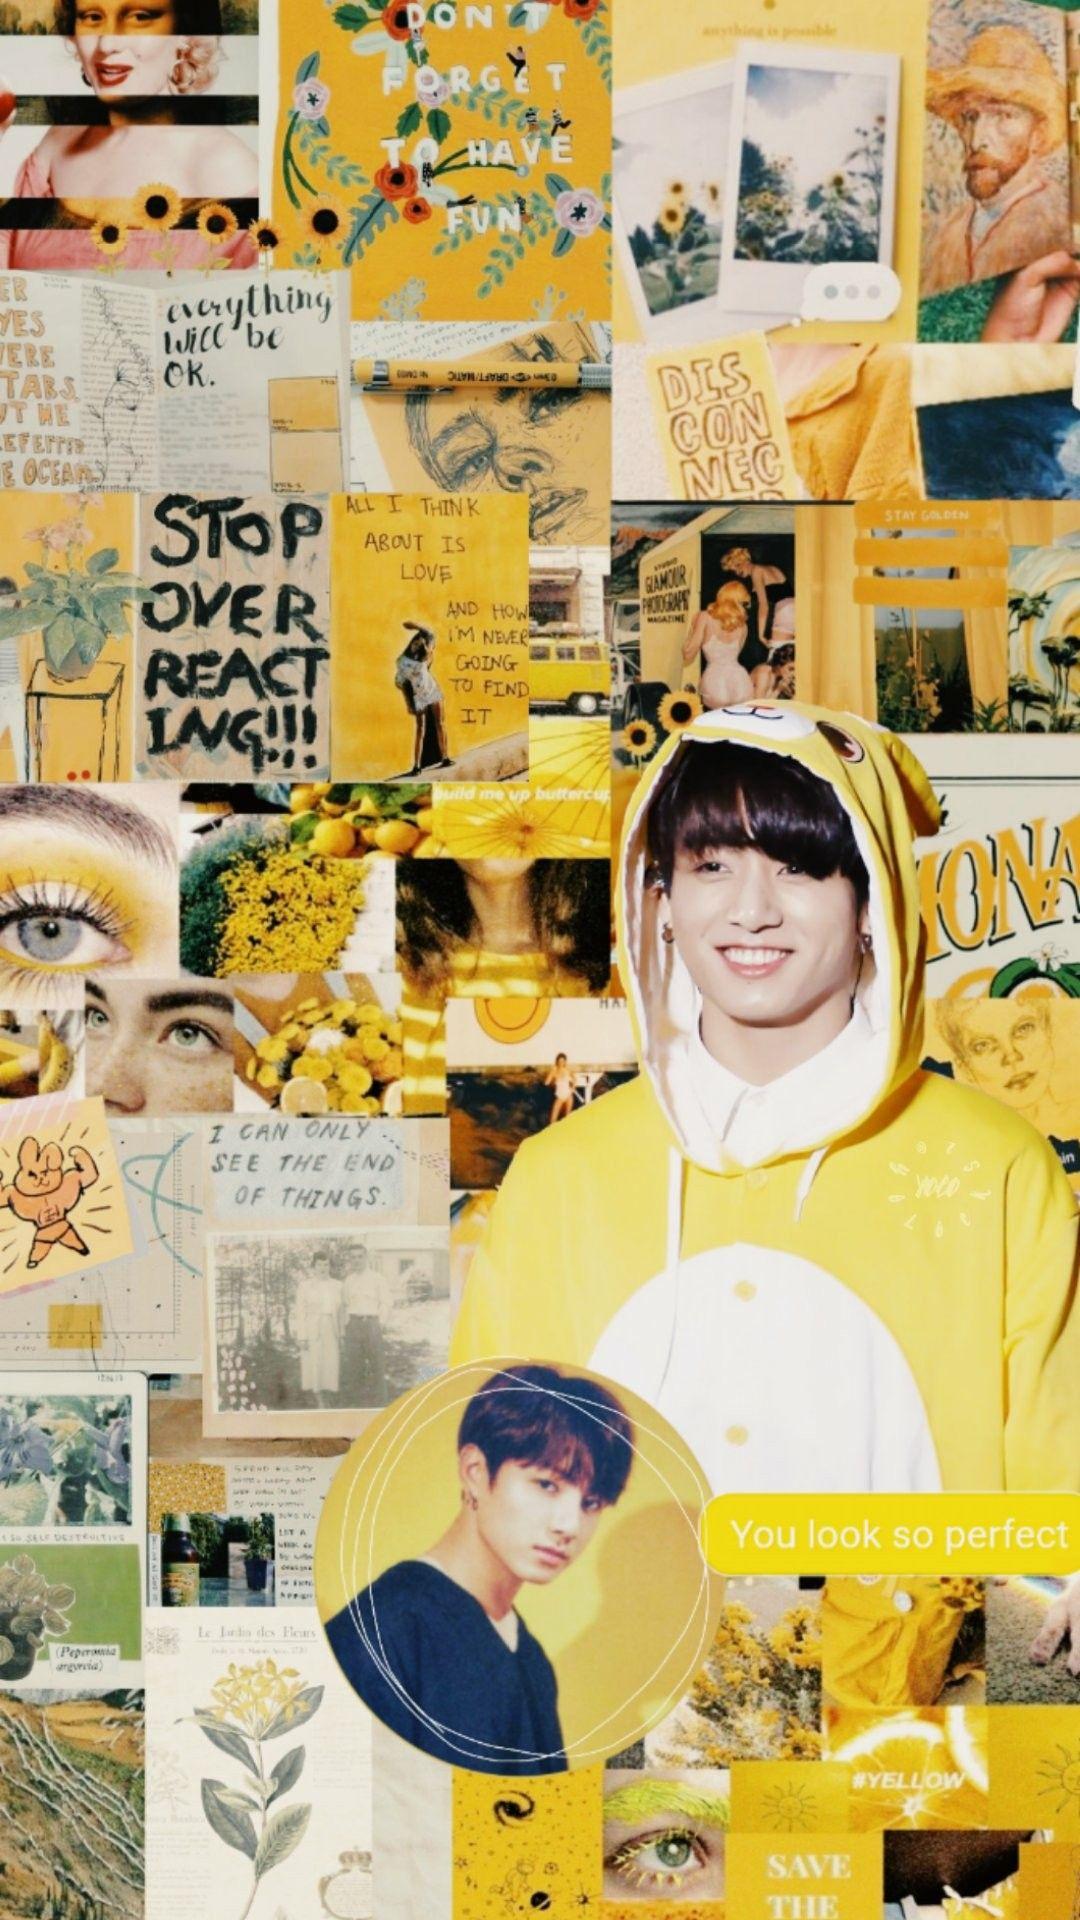 jungkook yellow aesthetic wallpaper credits to